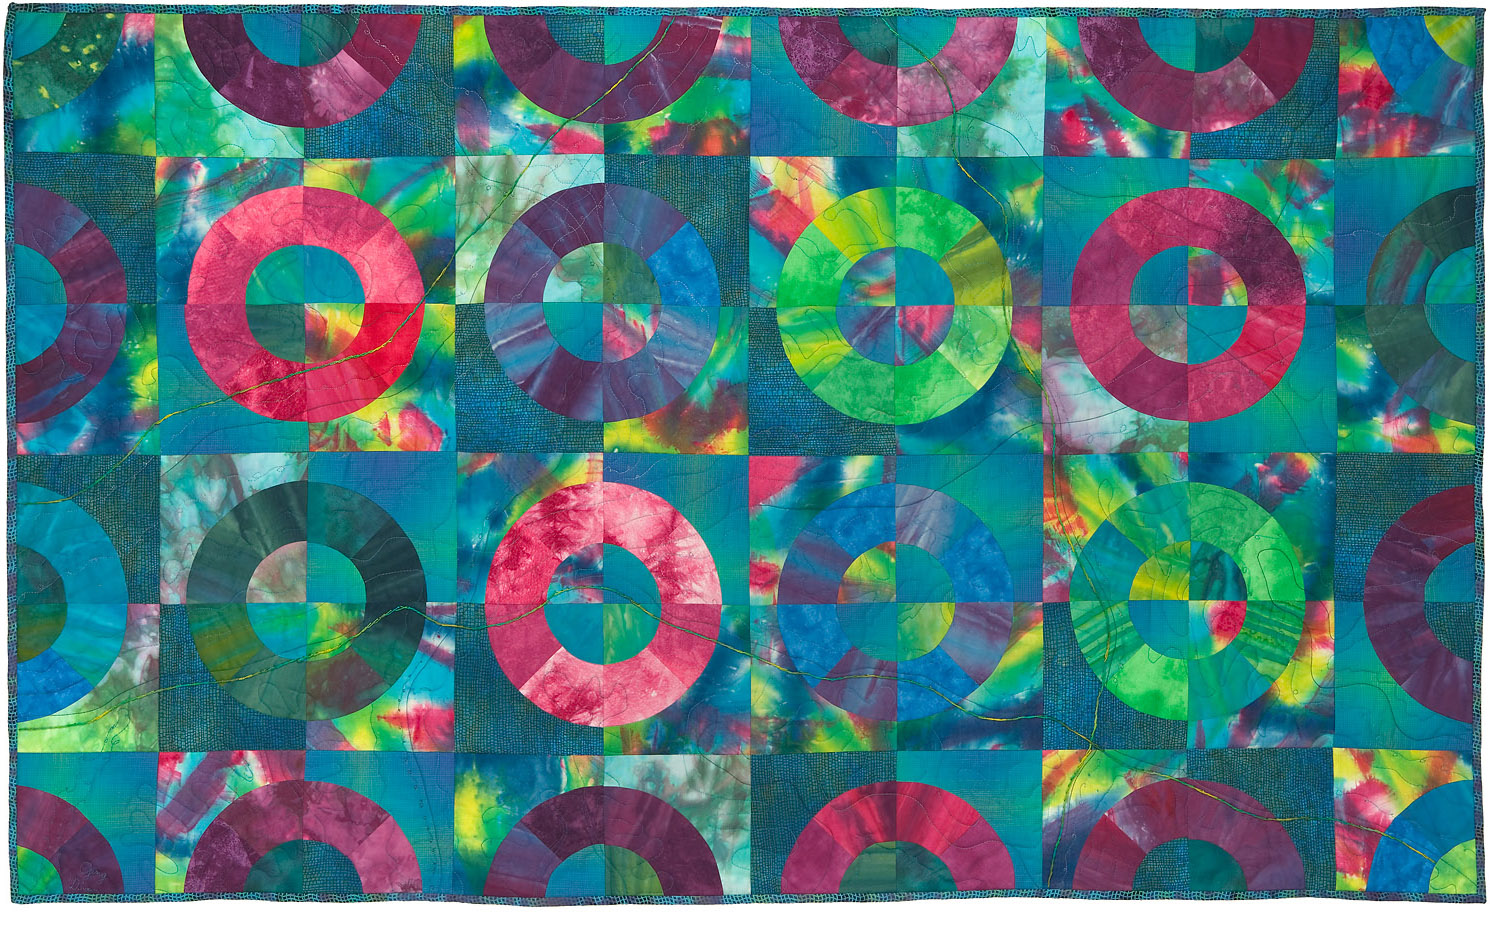 "Normal   0           false   false   false     EN-US   X-NONE   X-NONE                                                                                Beach Colors, 60"" wide x 30"" high, 2002"